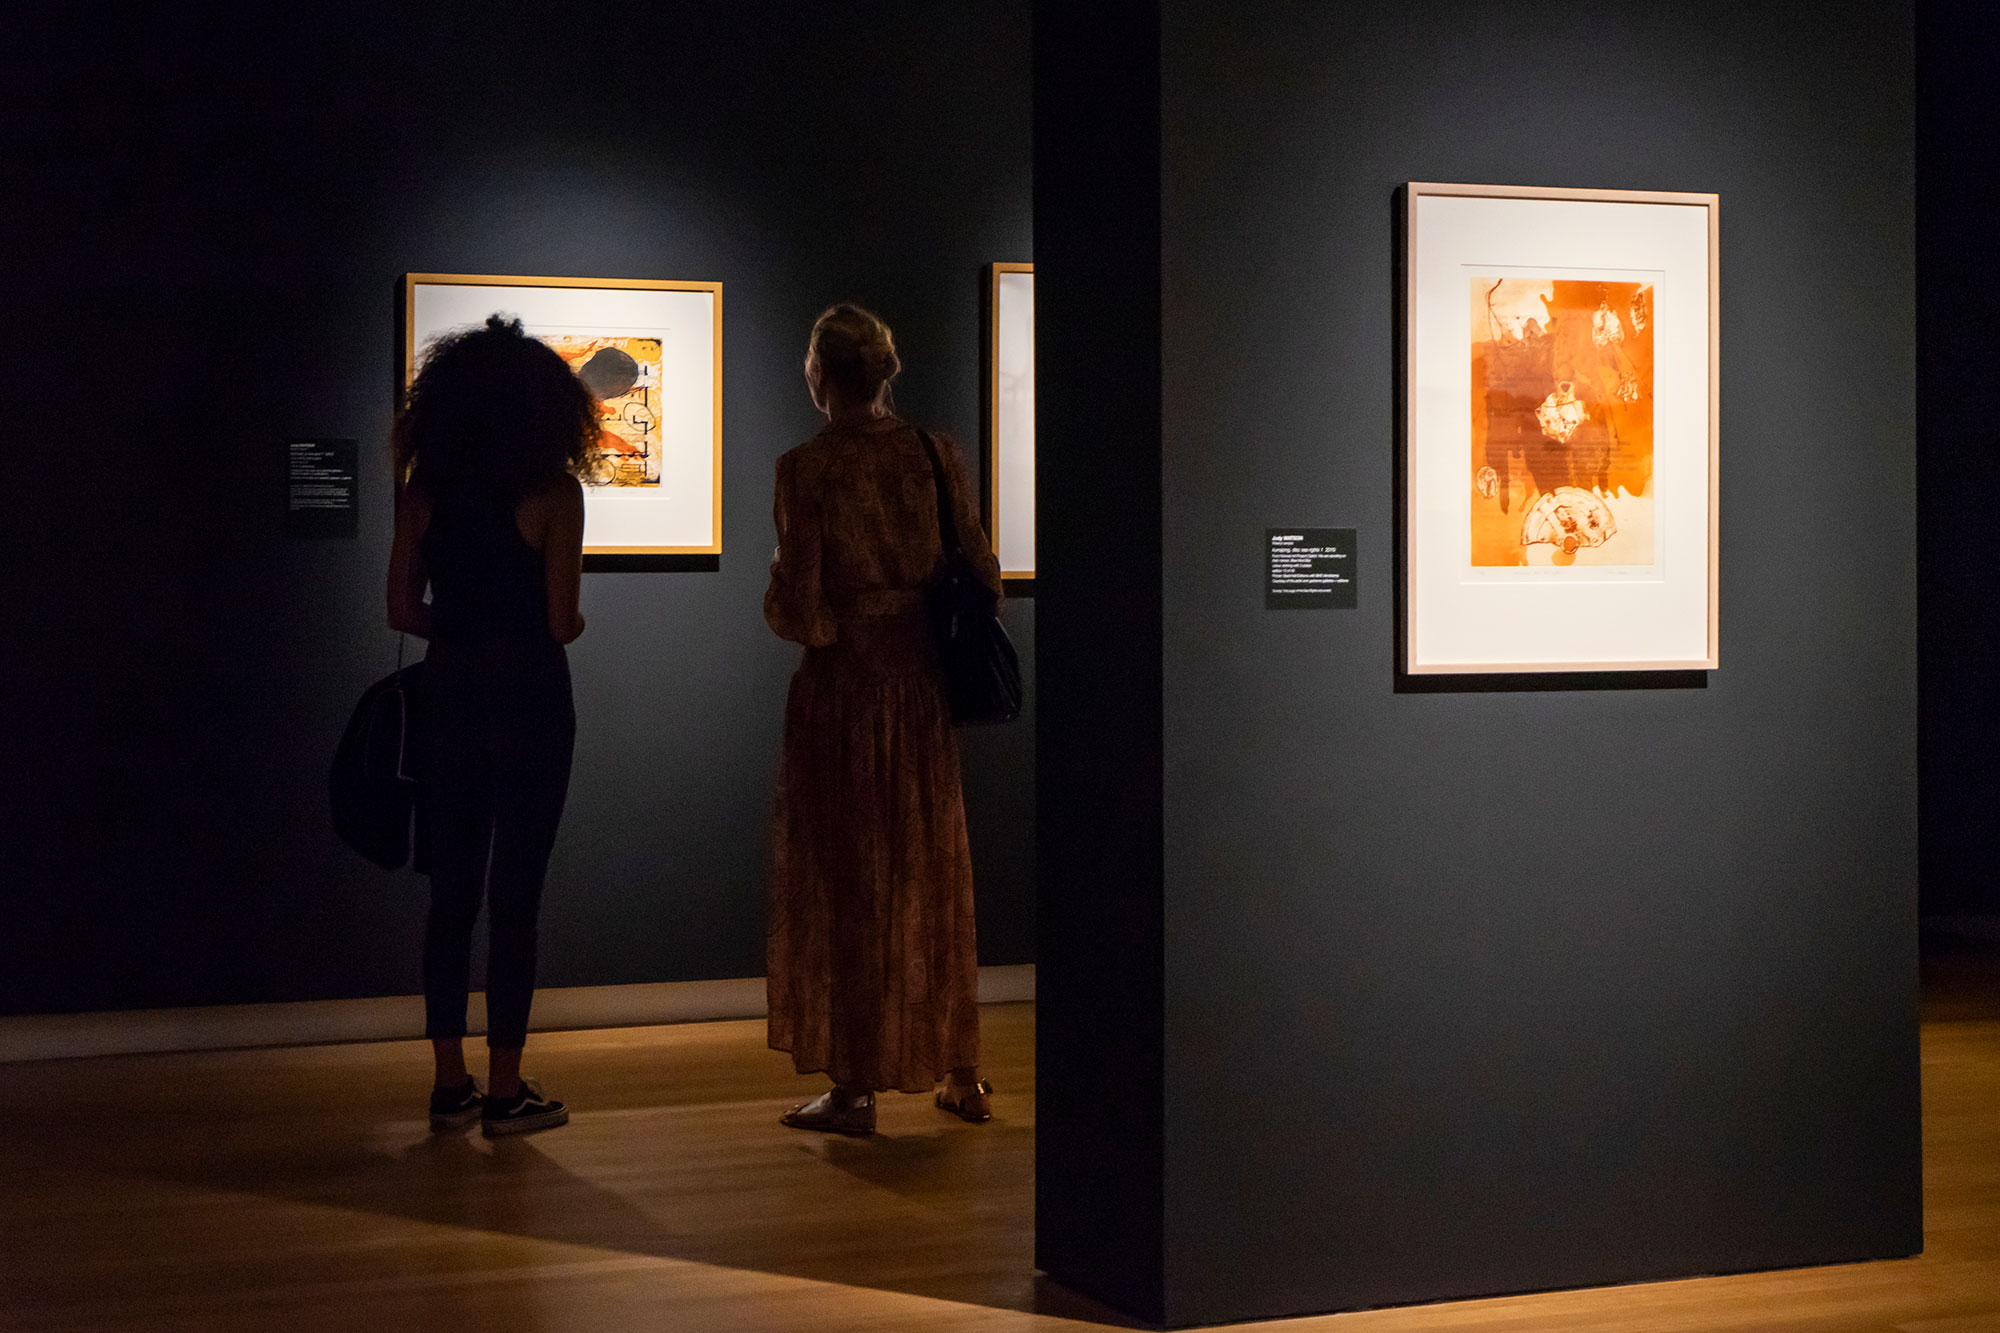 2 people analysing art at qut art museum